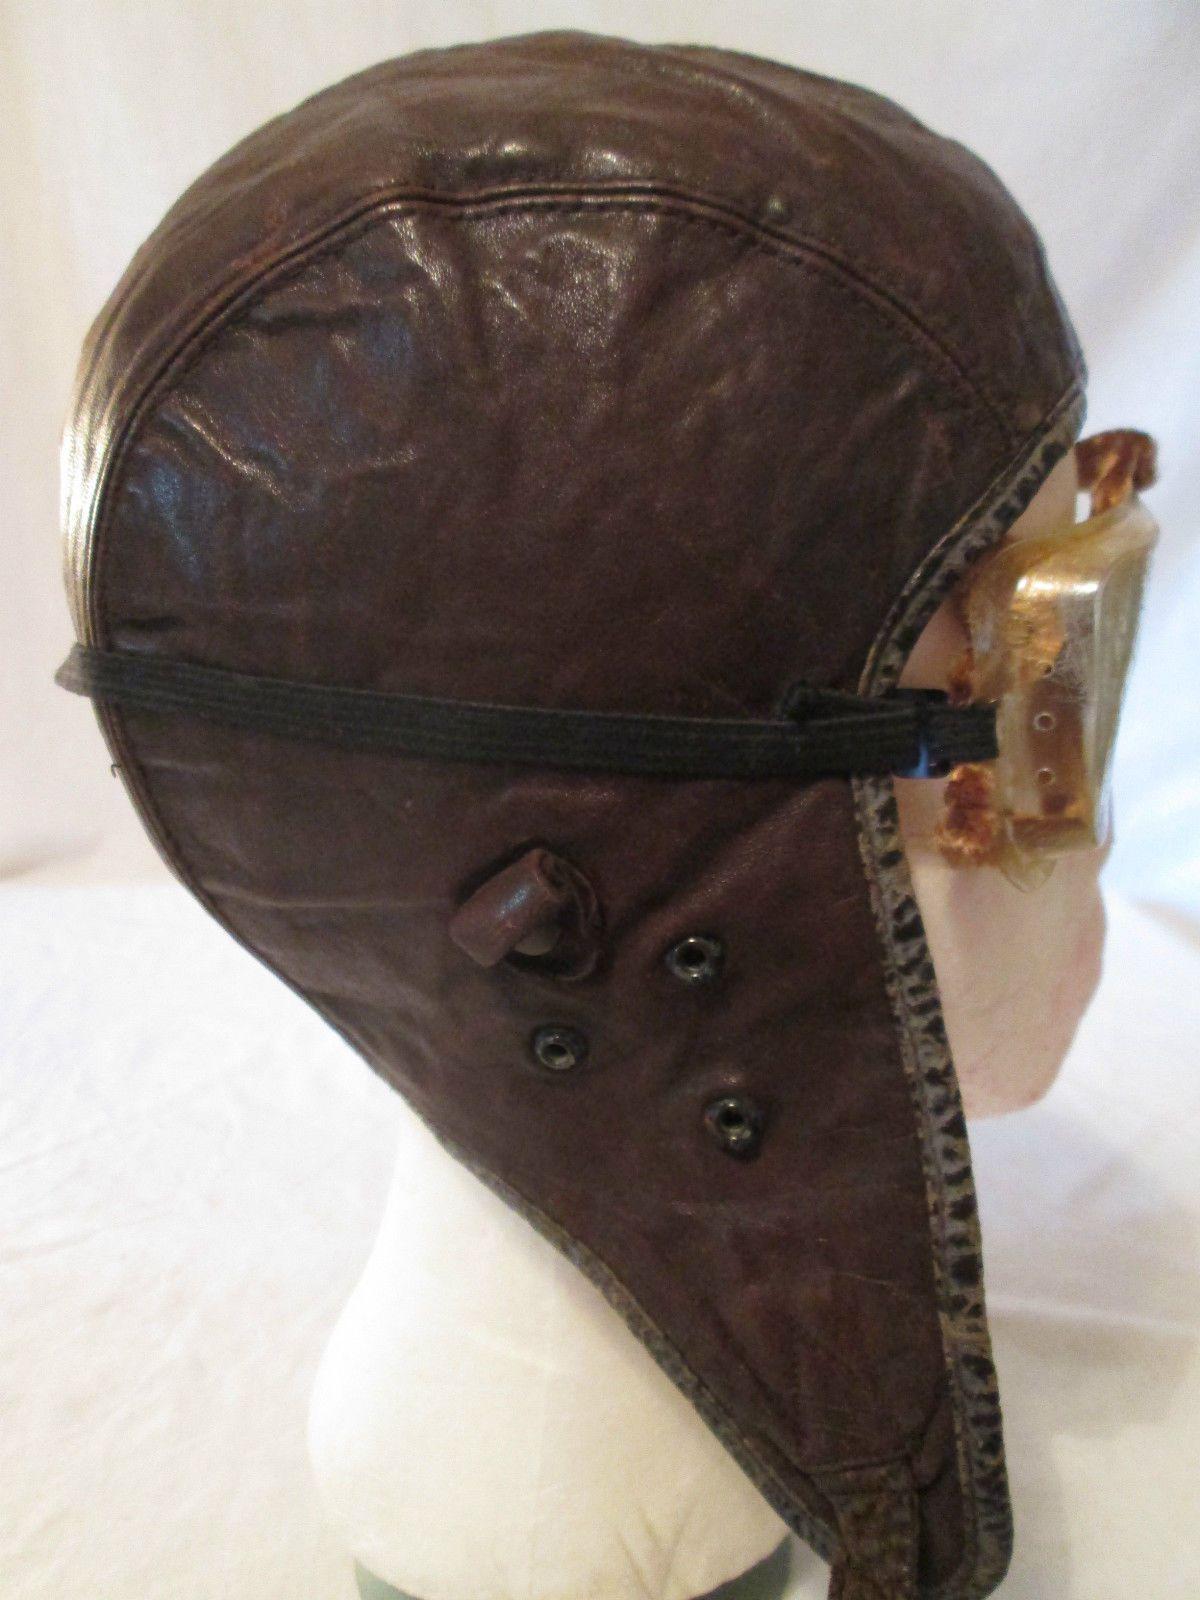 c8f8aa35306 Vintage Aviator Original Brown Leather WW2 WWll Helmet Goggles Maker in Hat  Who